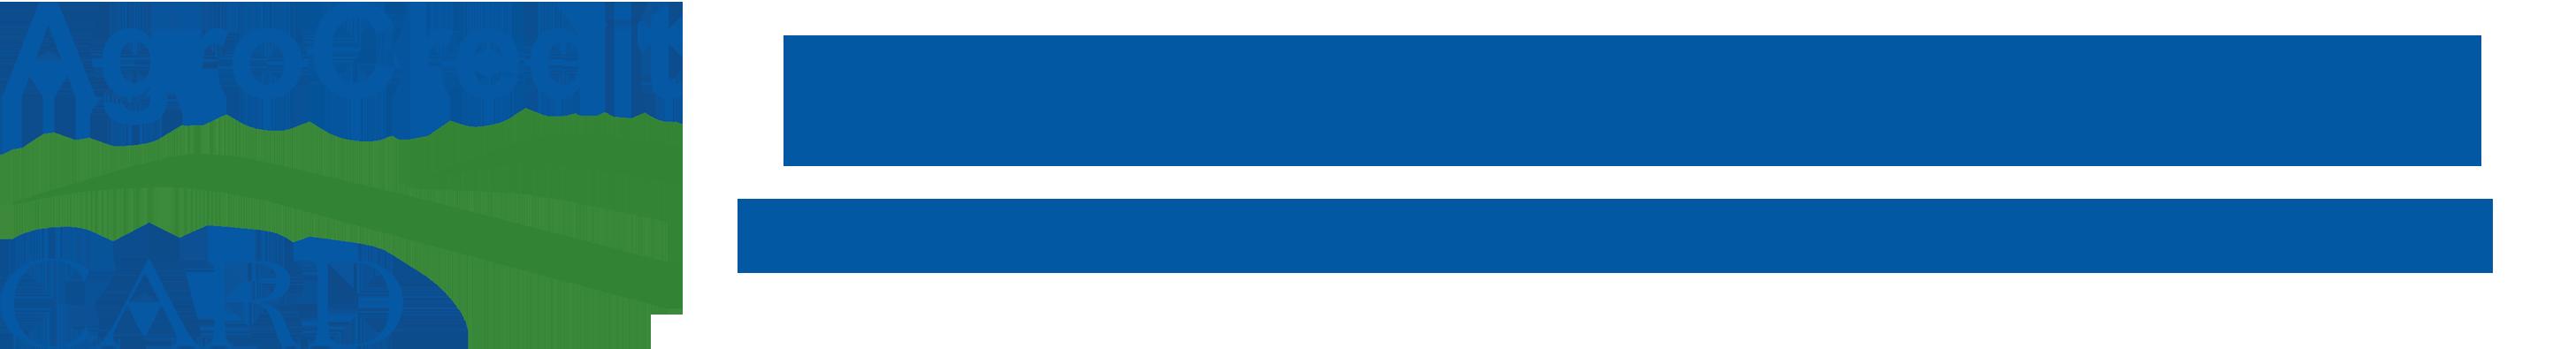 CARD Agro Credit